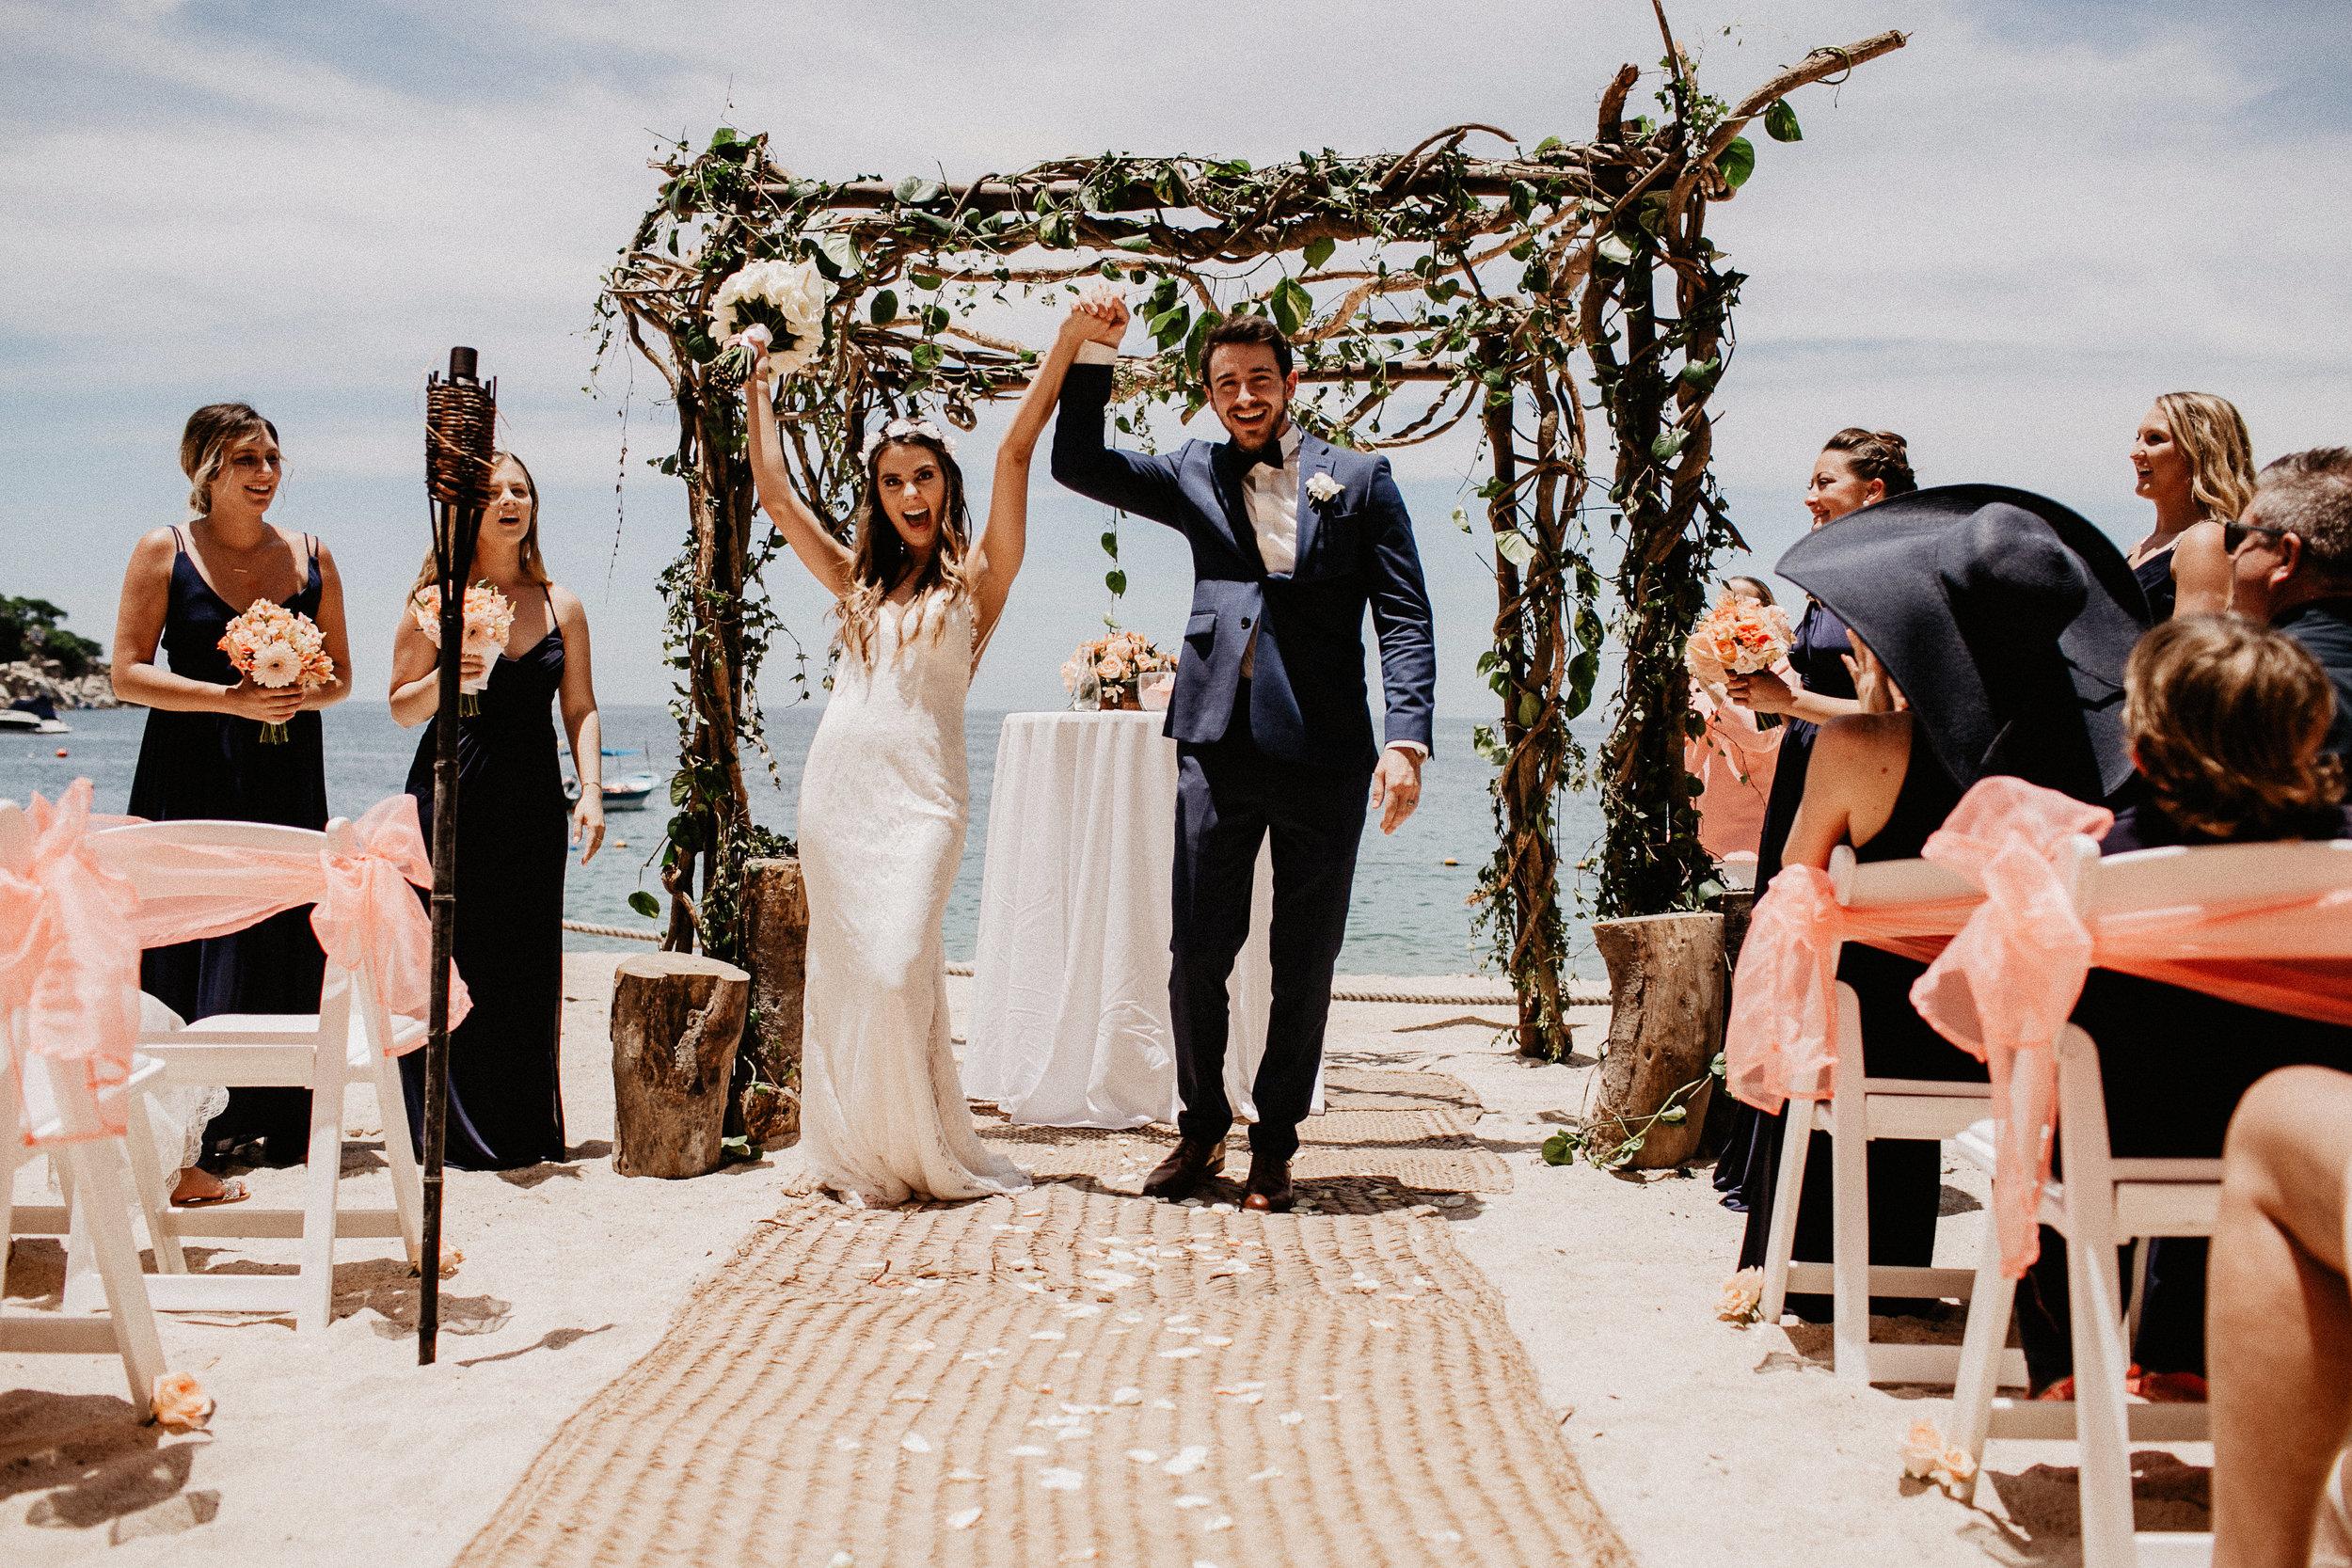 alfonso_flores_destination_wedding_photography_puerto_vallarta_hotel_barcelo_vallarta_cuttler_amela-258.JPG